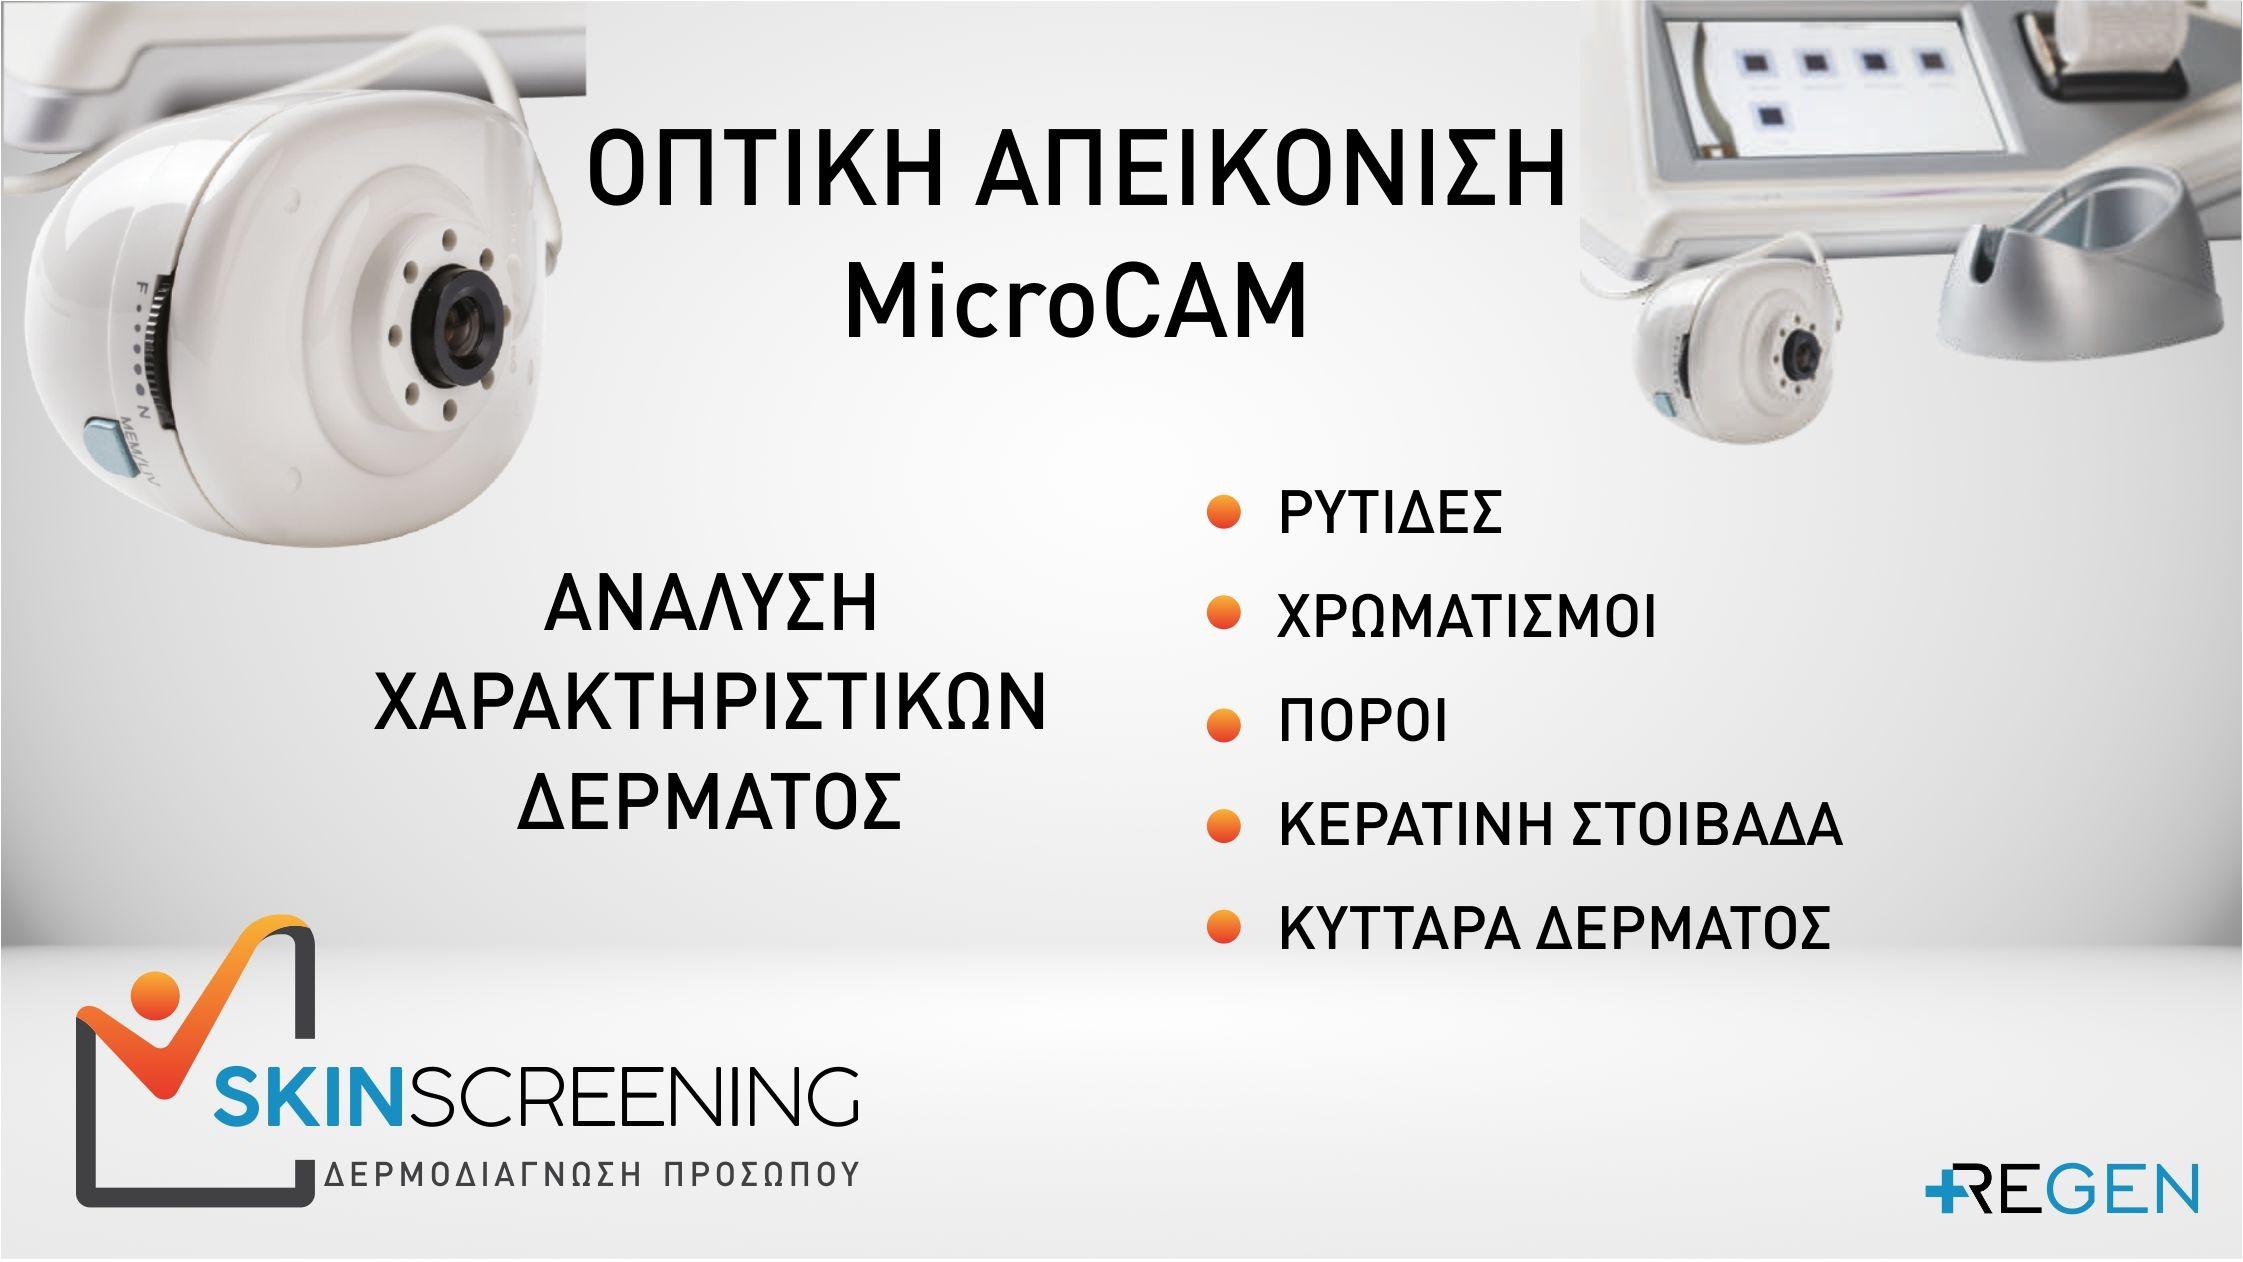 Skin Screening card06